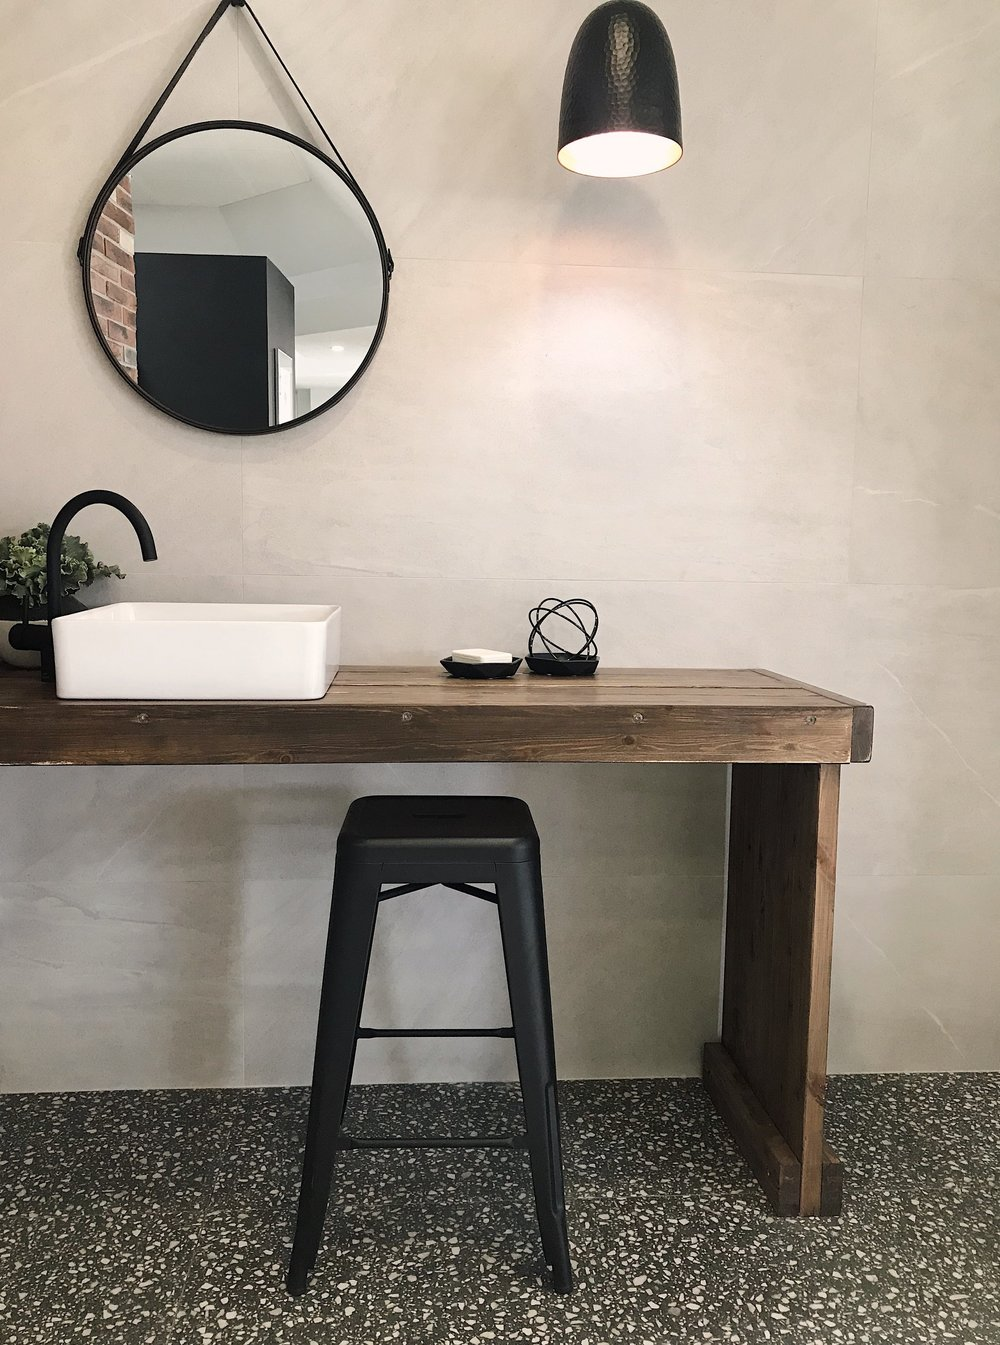 limestone avorio bathroom.JPG